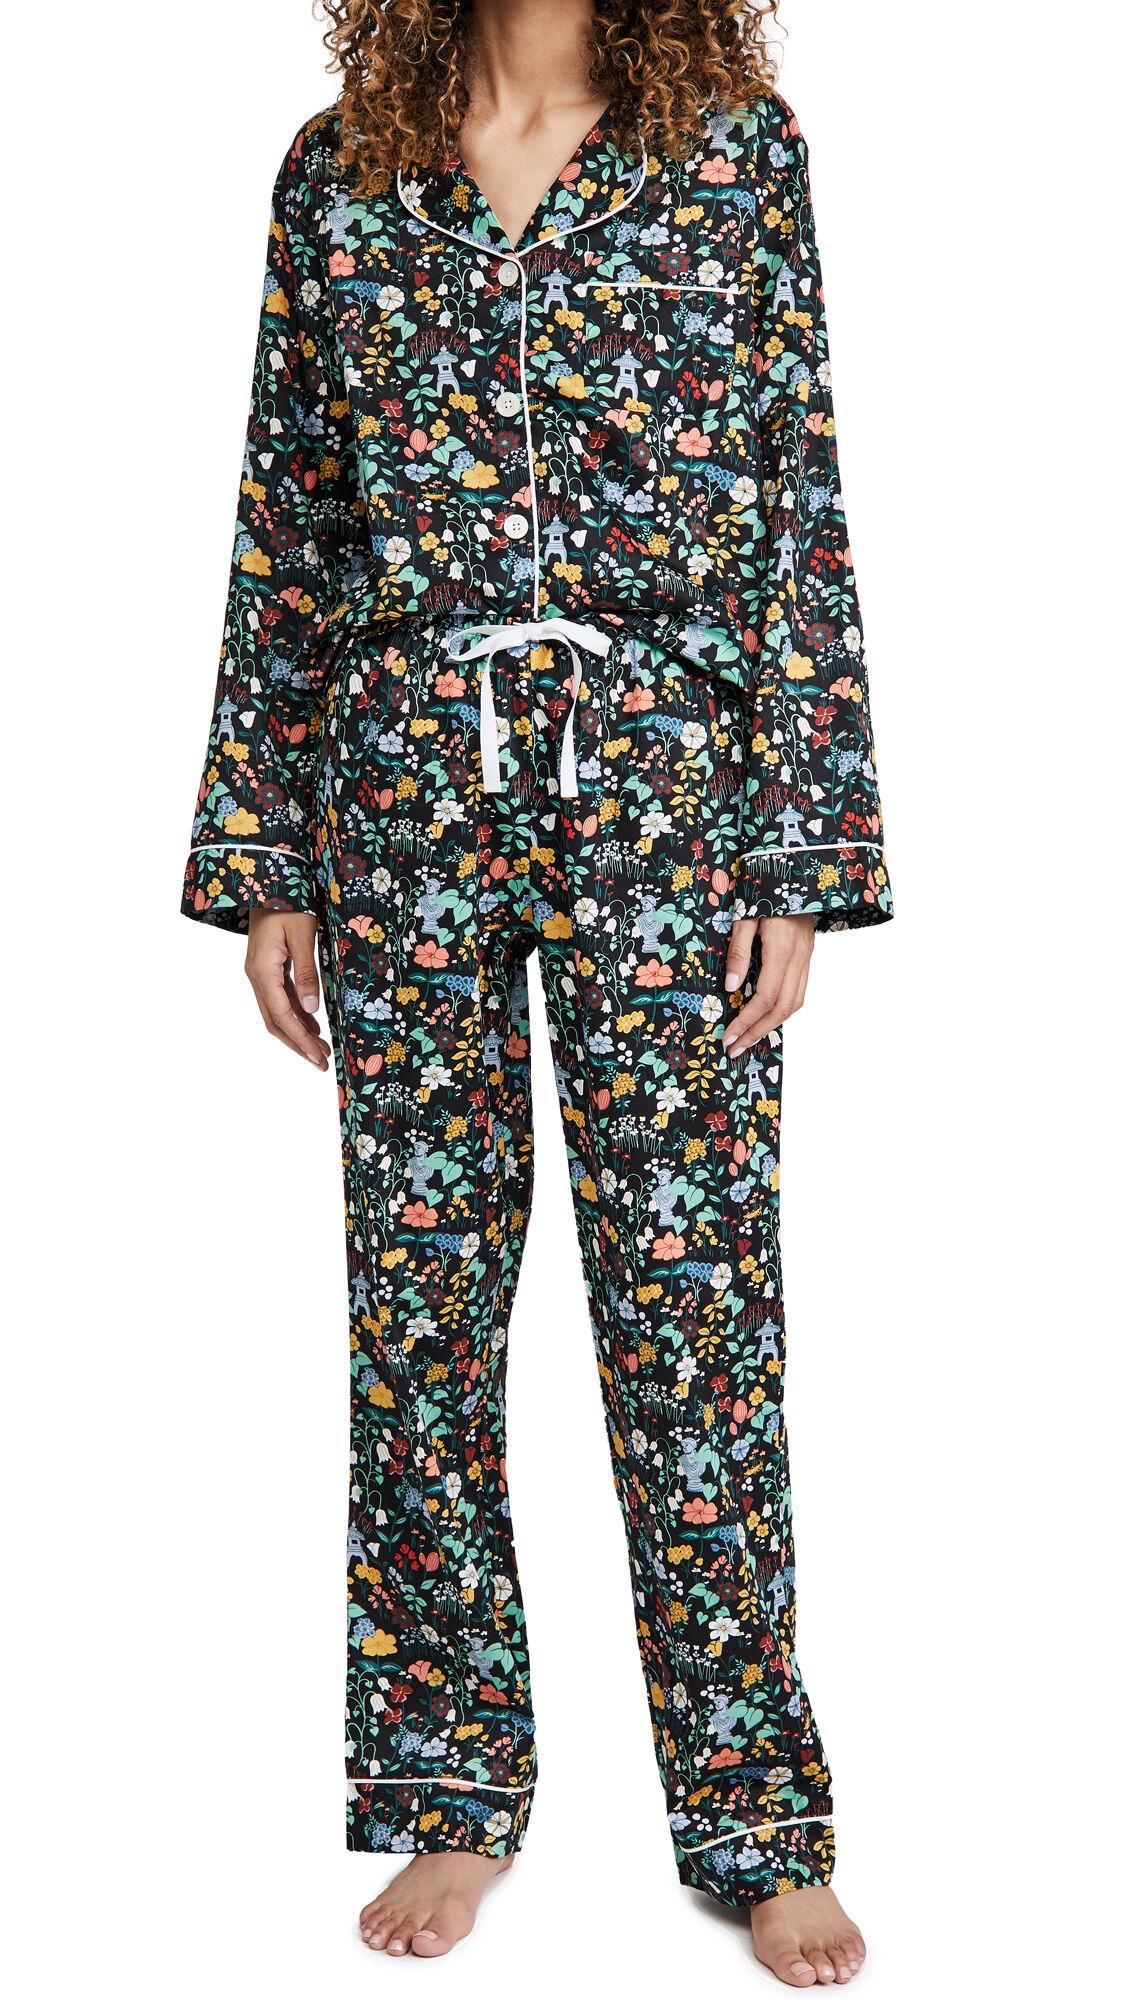 BedHead Pajamas Artist's Garden Classic Classic PJ Set  - Artist'S Garden - Size: Extra Large